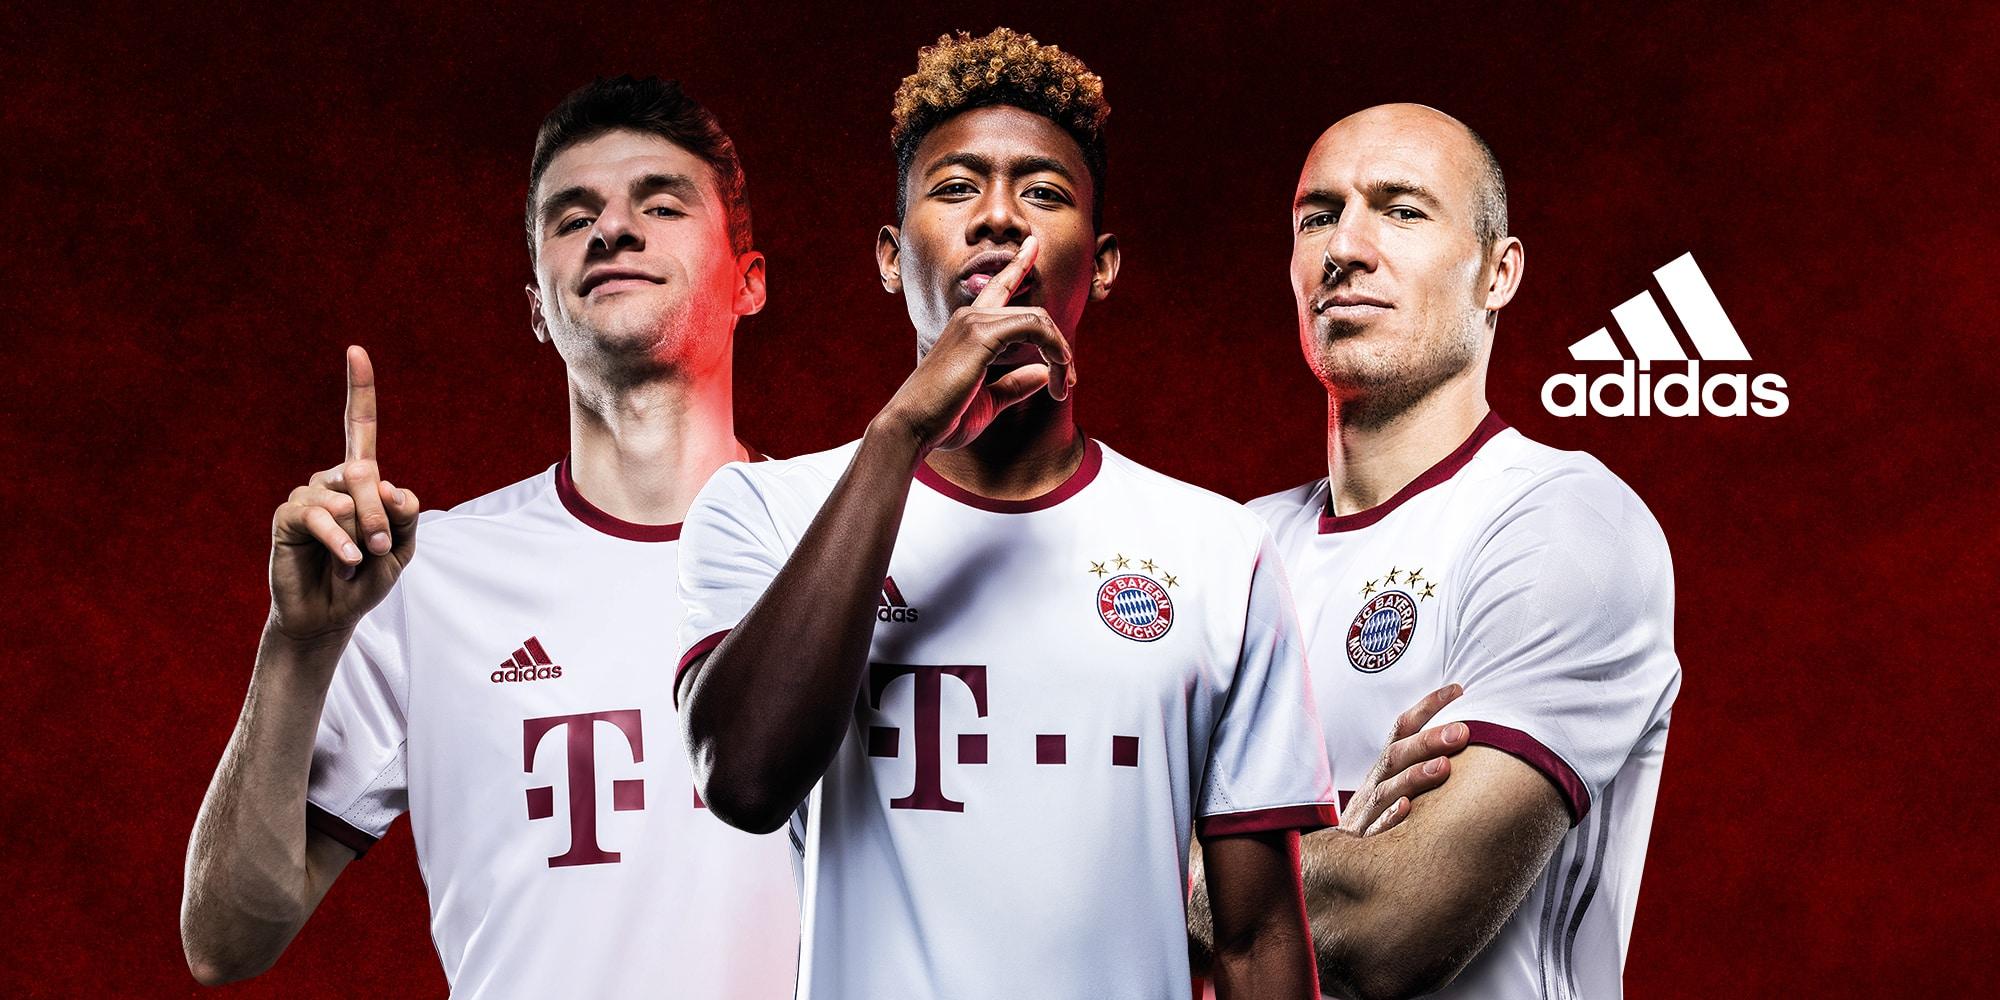 Maillot THIRD FC Bayern München Paul Will